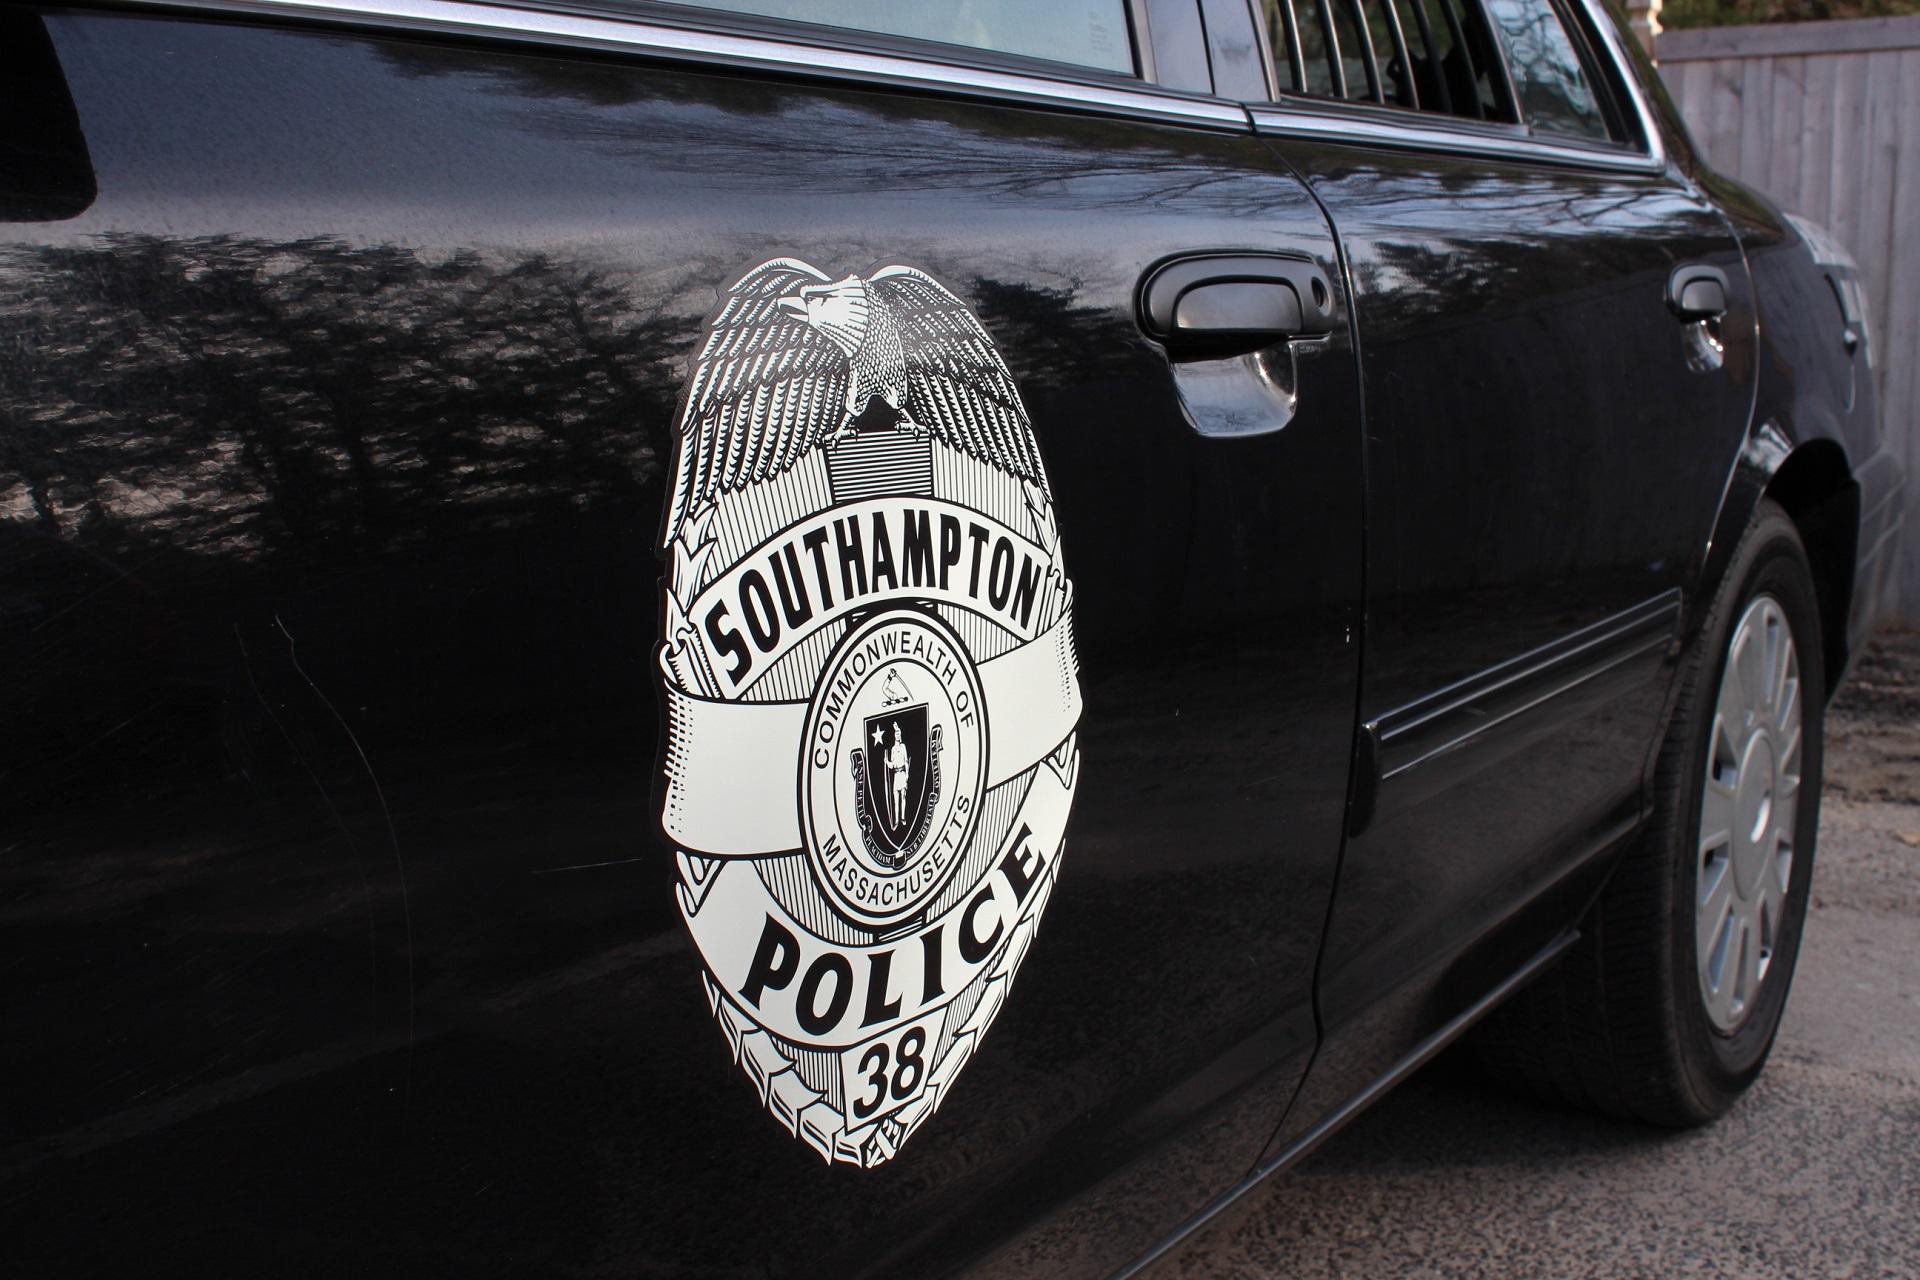 Southampton_Police_Vehicle2_1524852675837.jpg